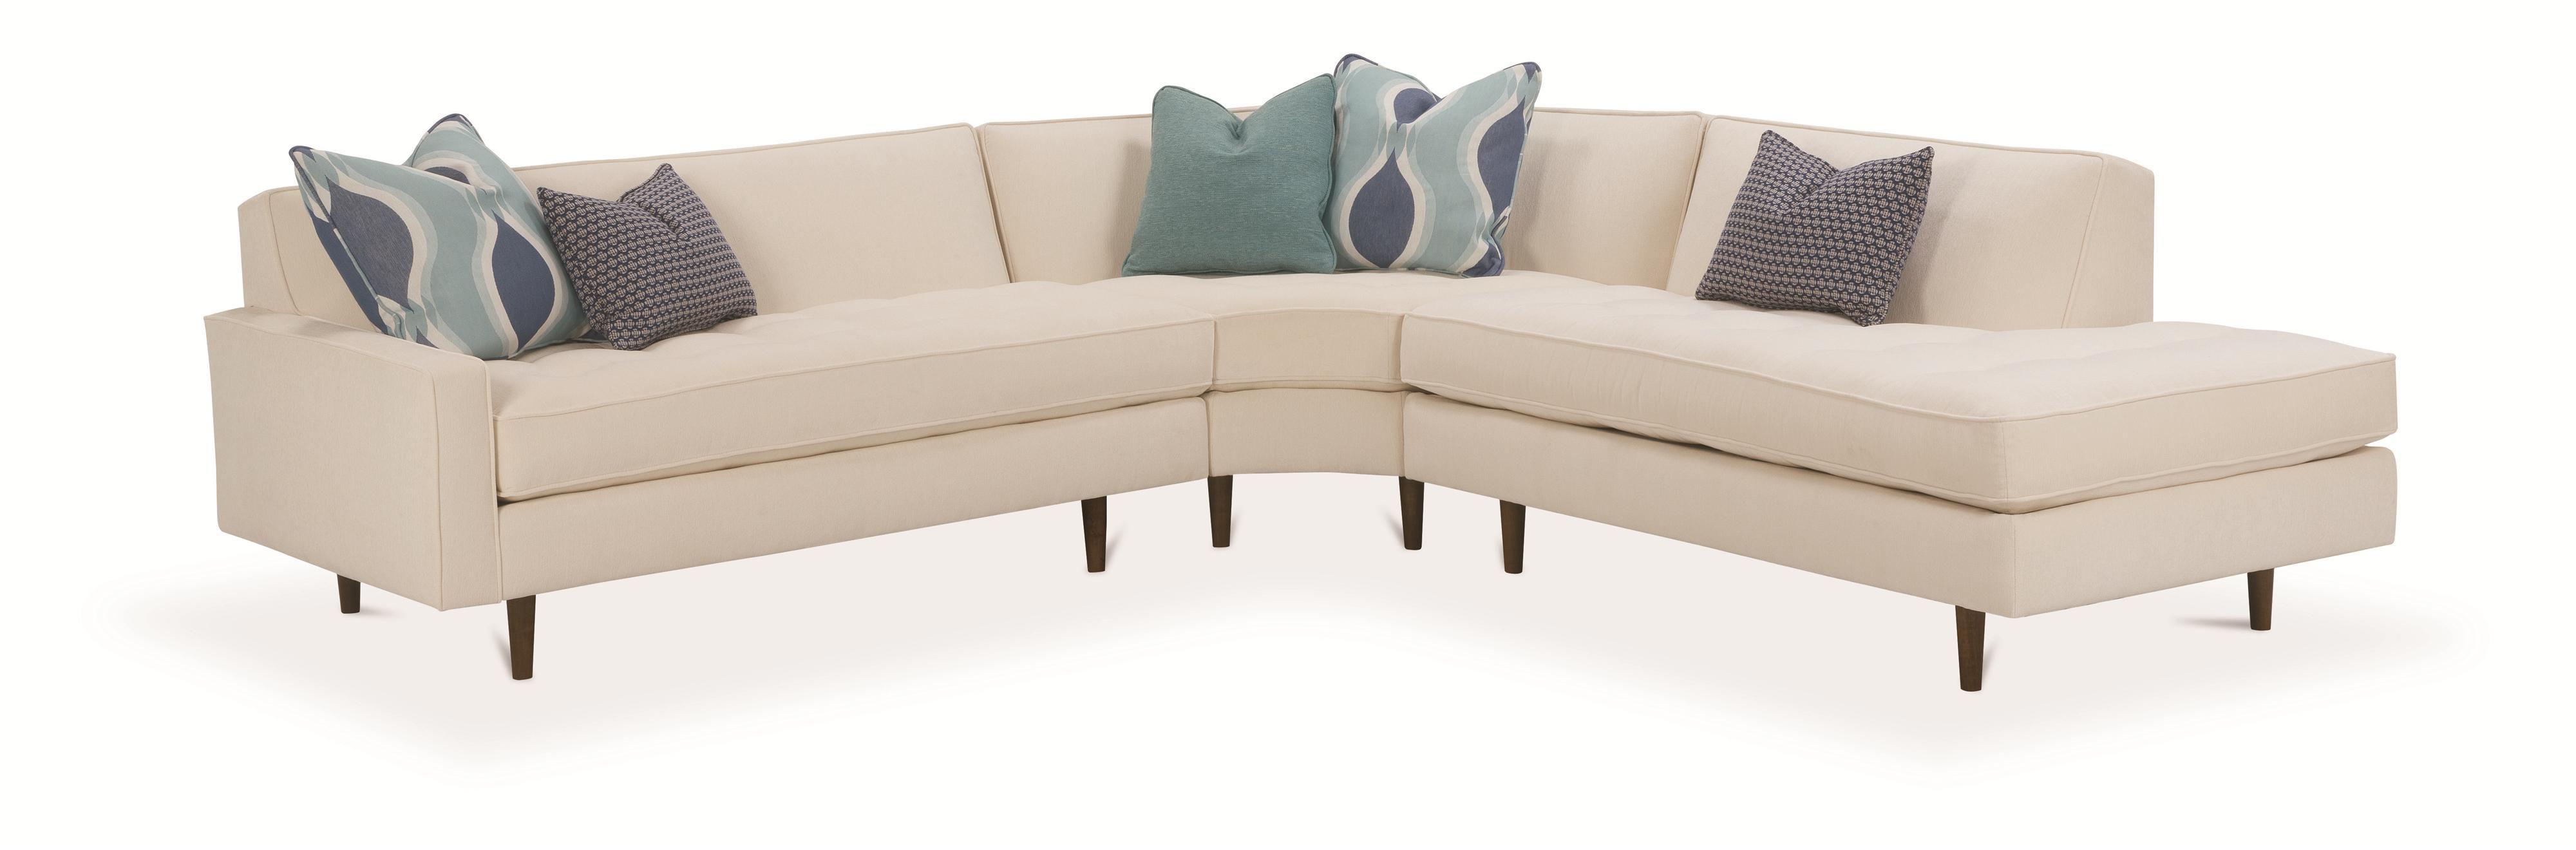 Rowe Brady Contemporary 3 Piece Sectional Sofa Reeds Furniture